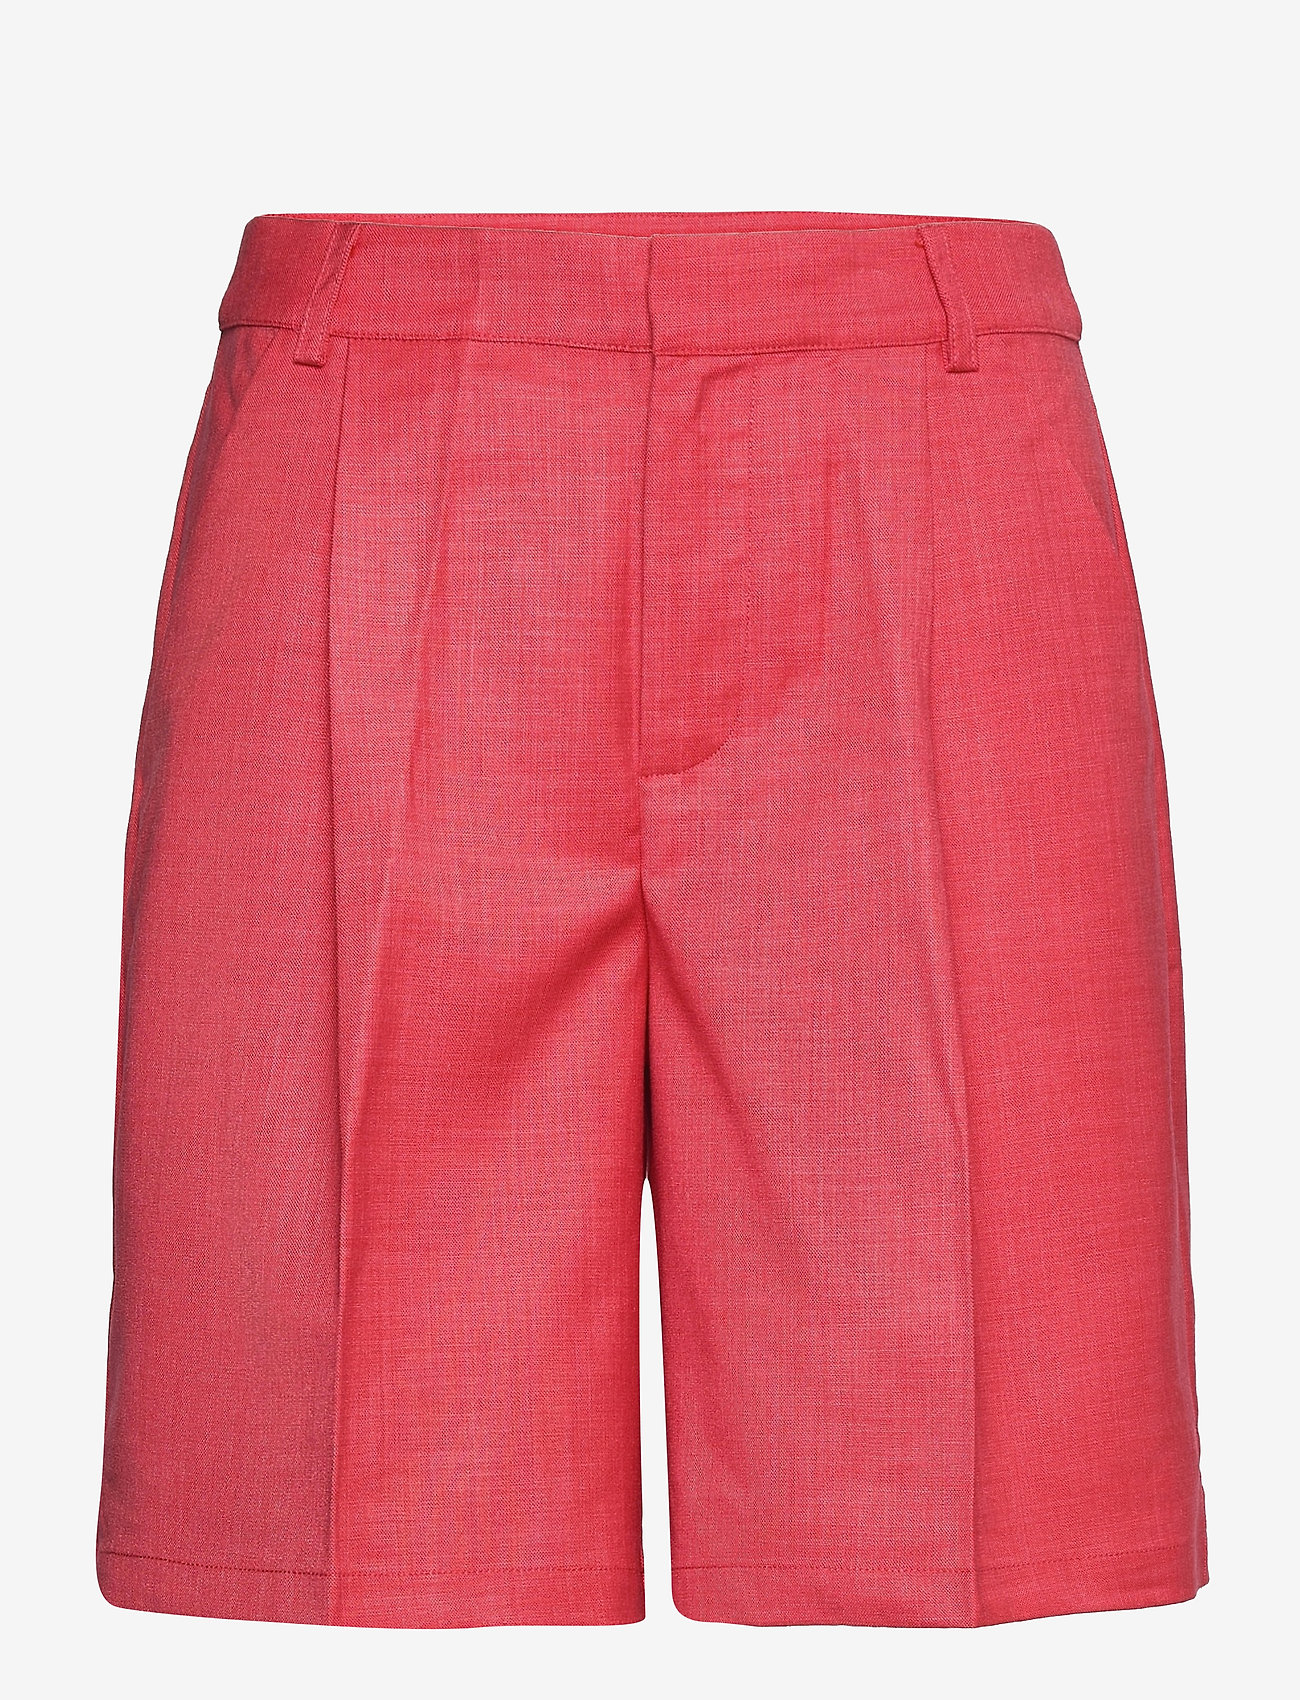 Résumé - ElodieRS - chino shorts - red - 0